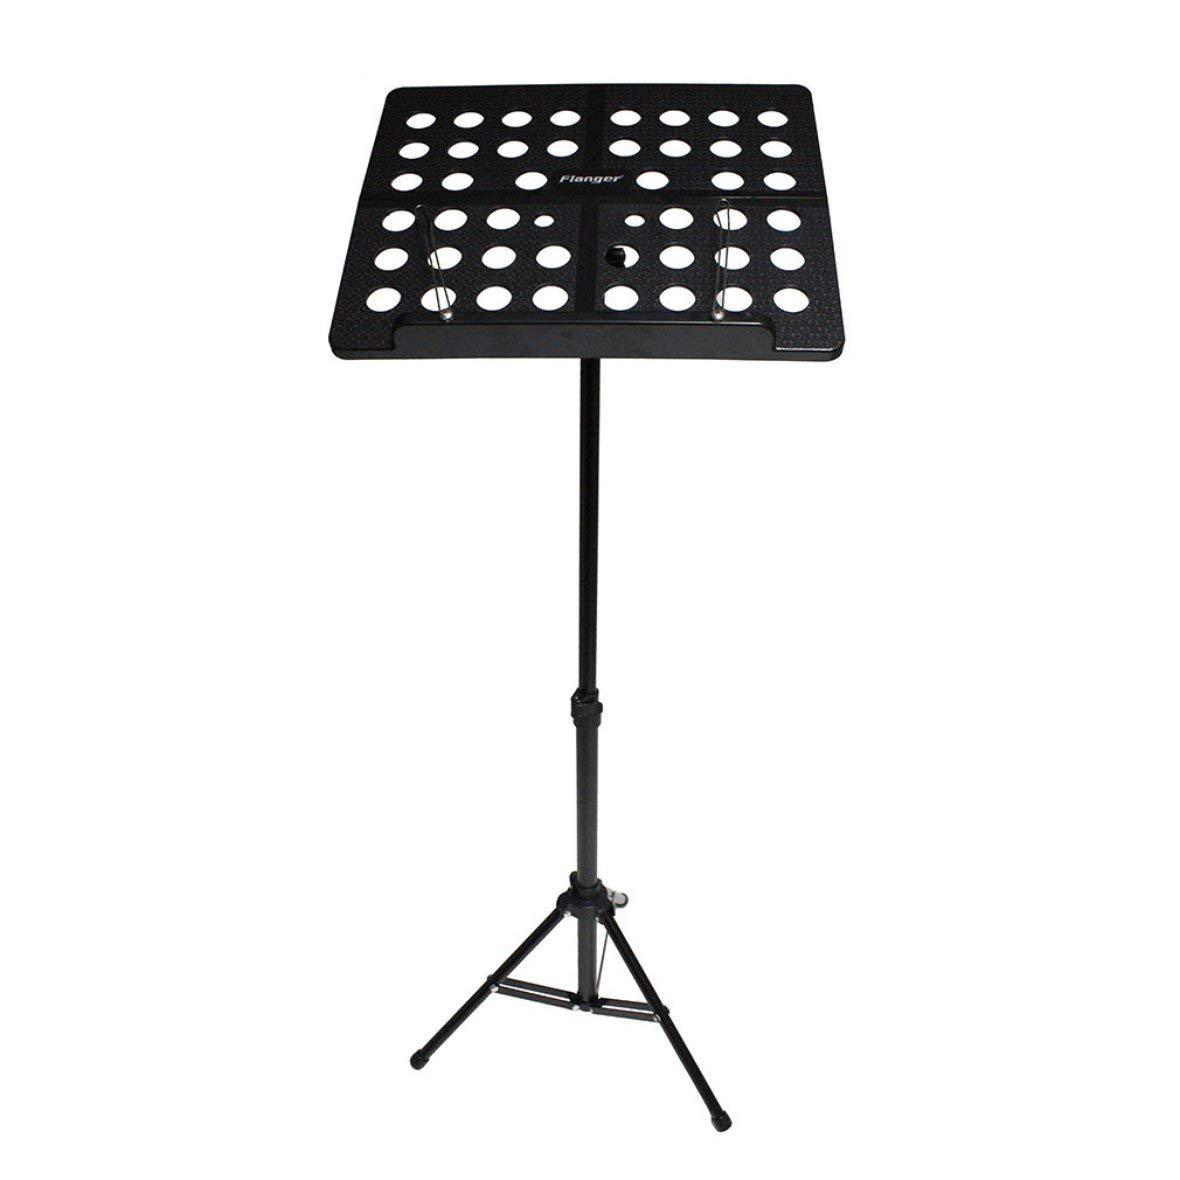 Heaviesk Soporte de música Flanger FL-05R Aleación de Aluminio Plegable Soporte de música Soporte de trípode Soporte de Instrumento Musical con Bolsa de Transporte